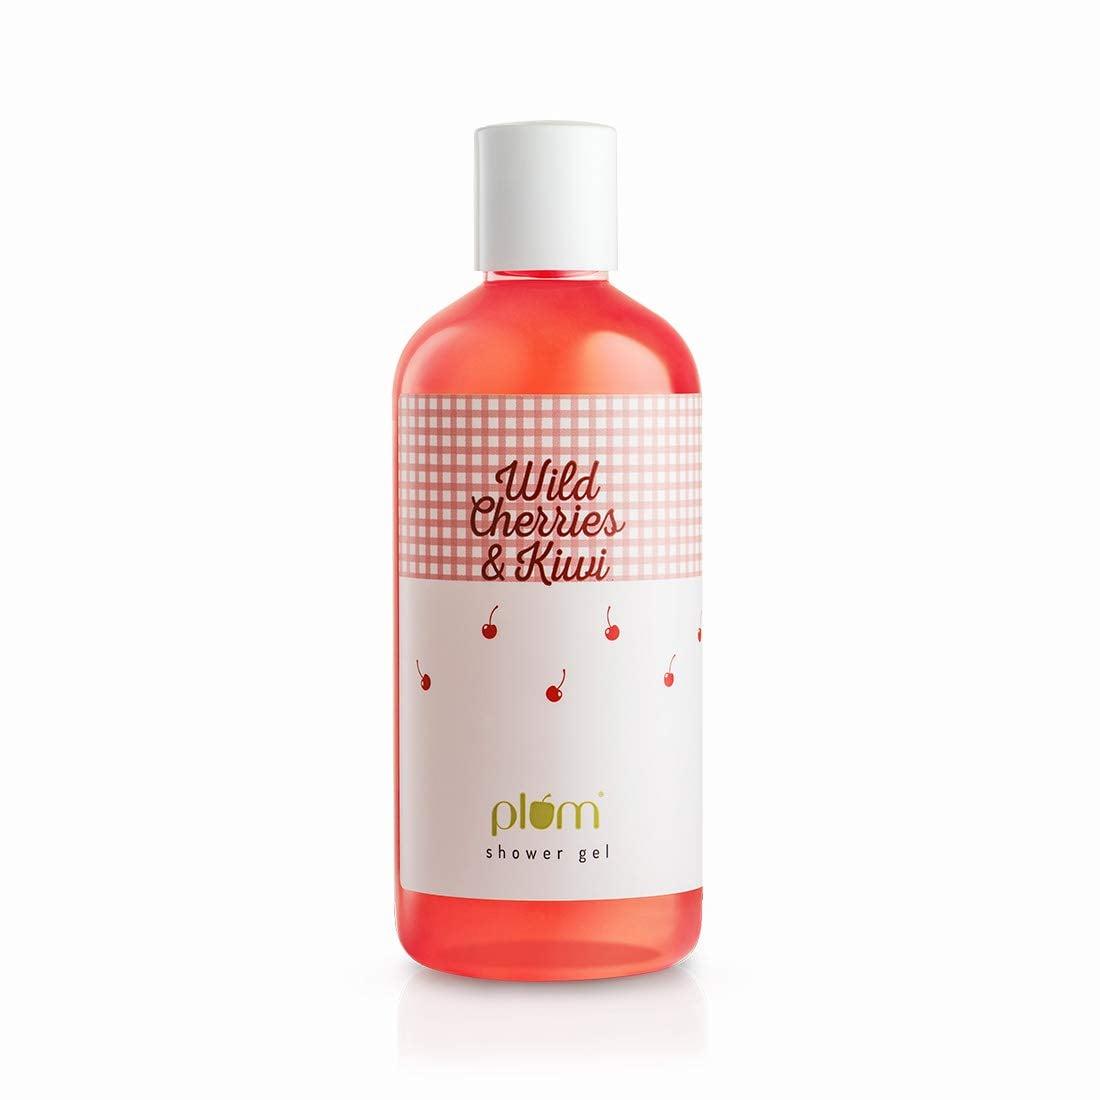 Plum Wild Cherries & Kiwi Shower Gel (300 ml)